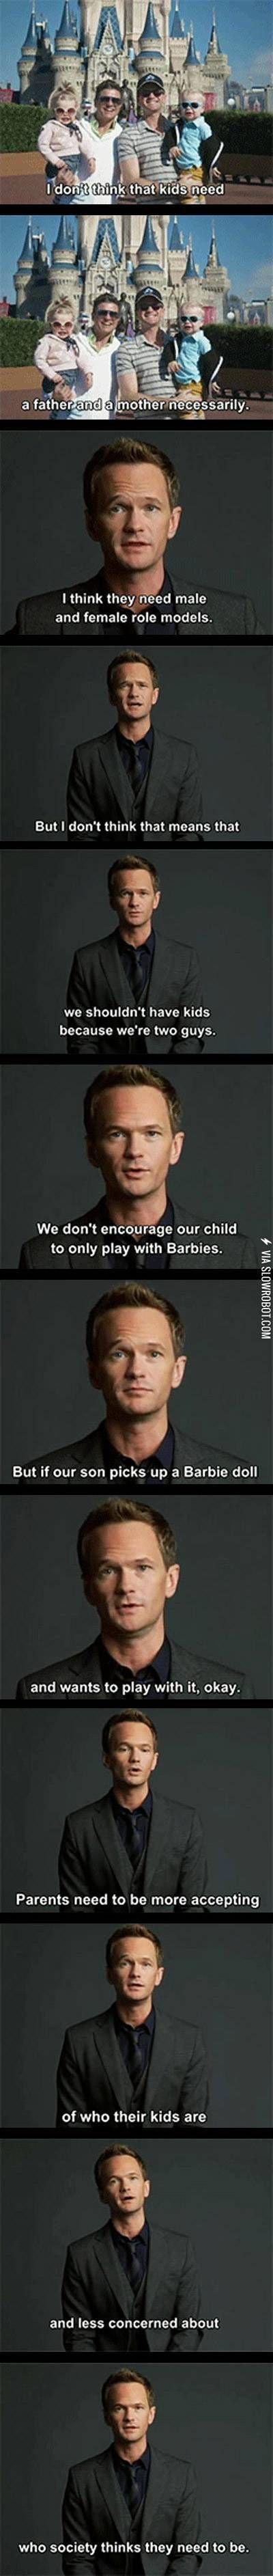 Neil Patrick Harris on parenting.